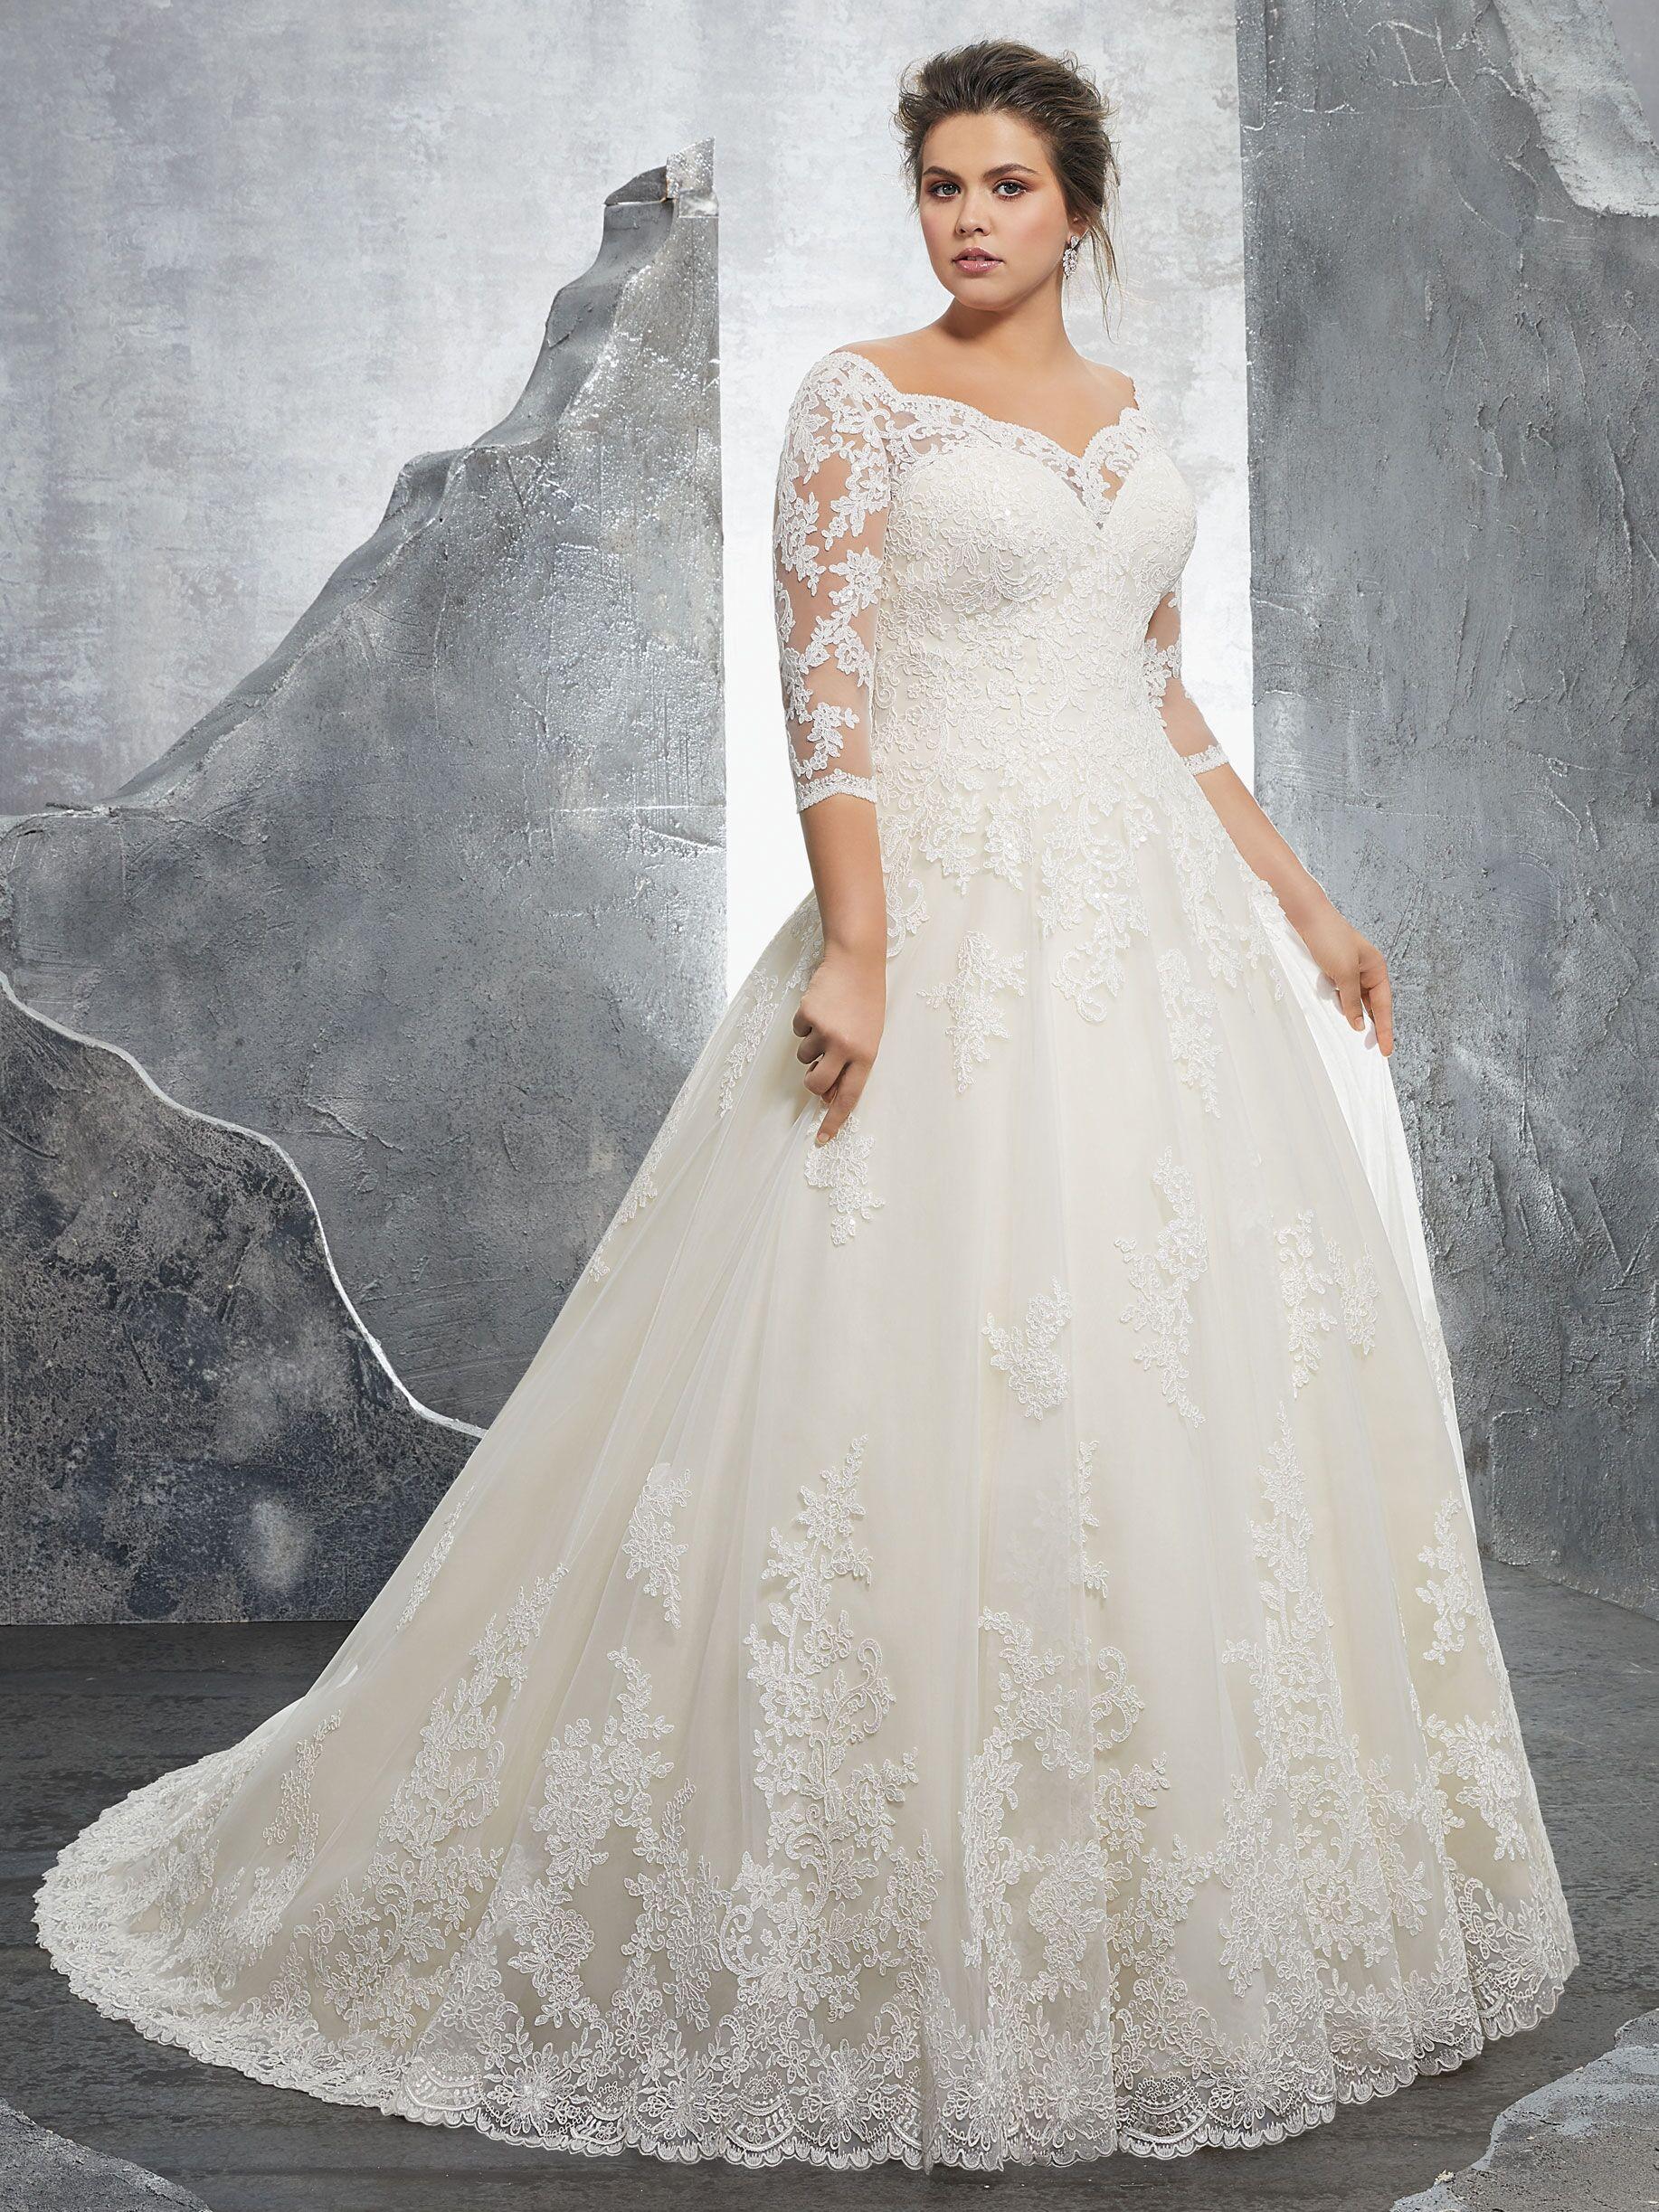 39aed1c538ef 97+ Flattering Wedding Dresses For Plus Size Brides - 20 Gorgeous ...